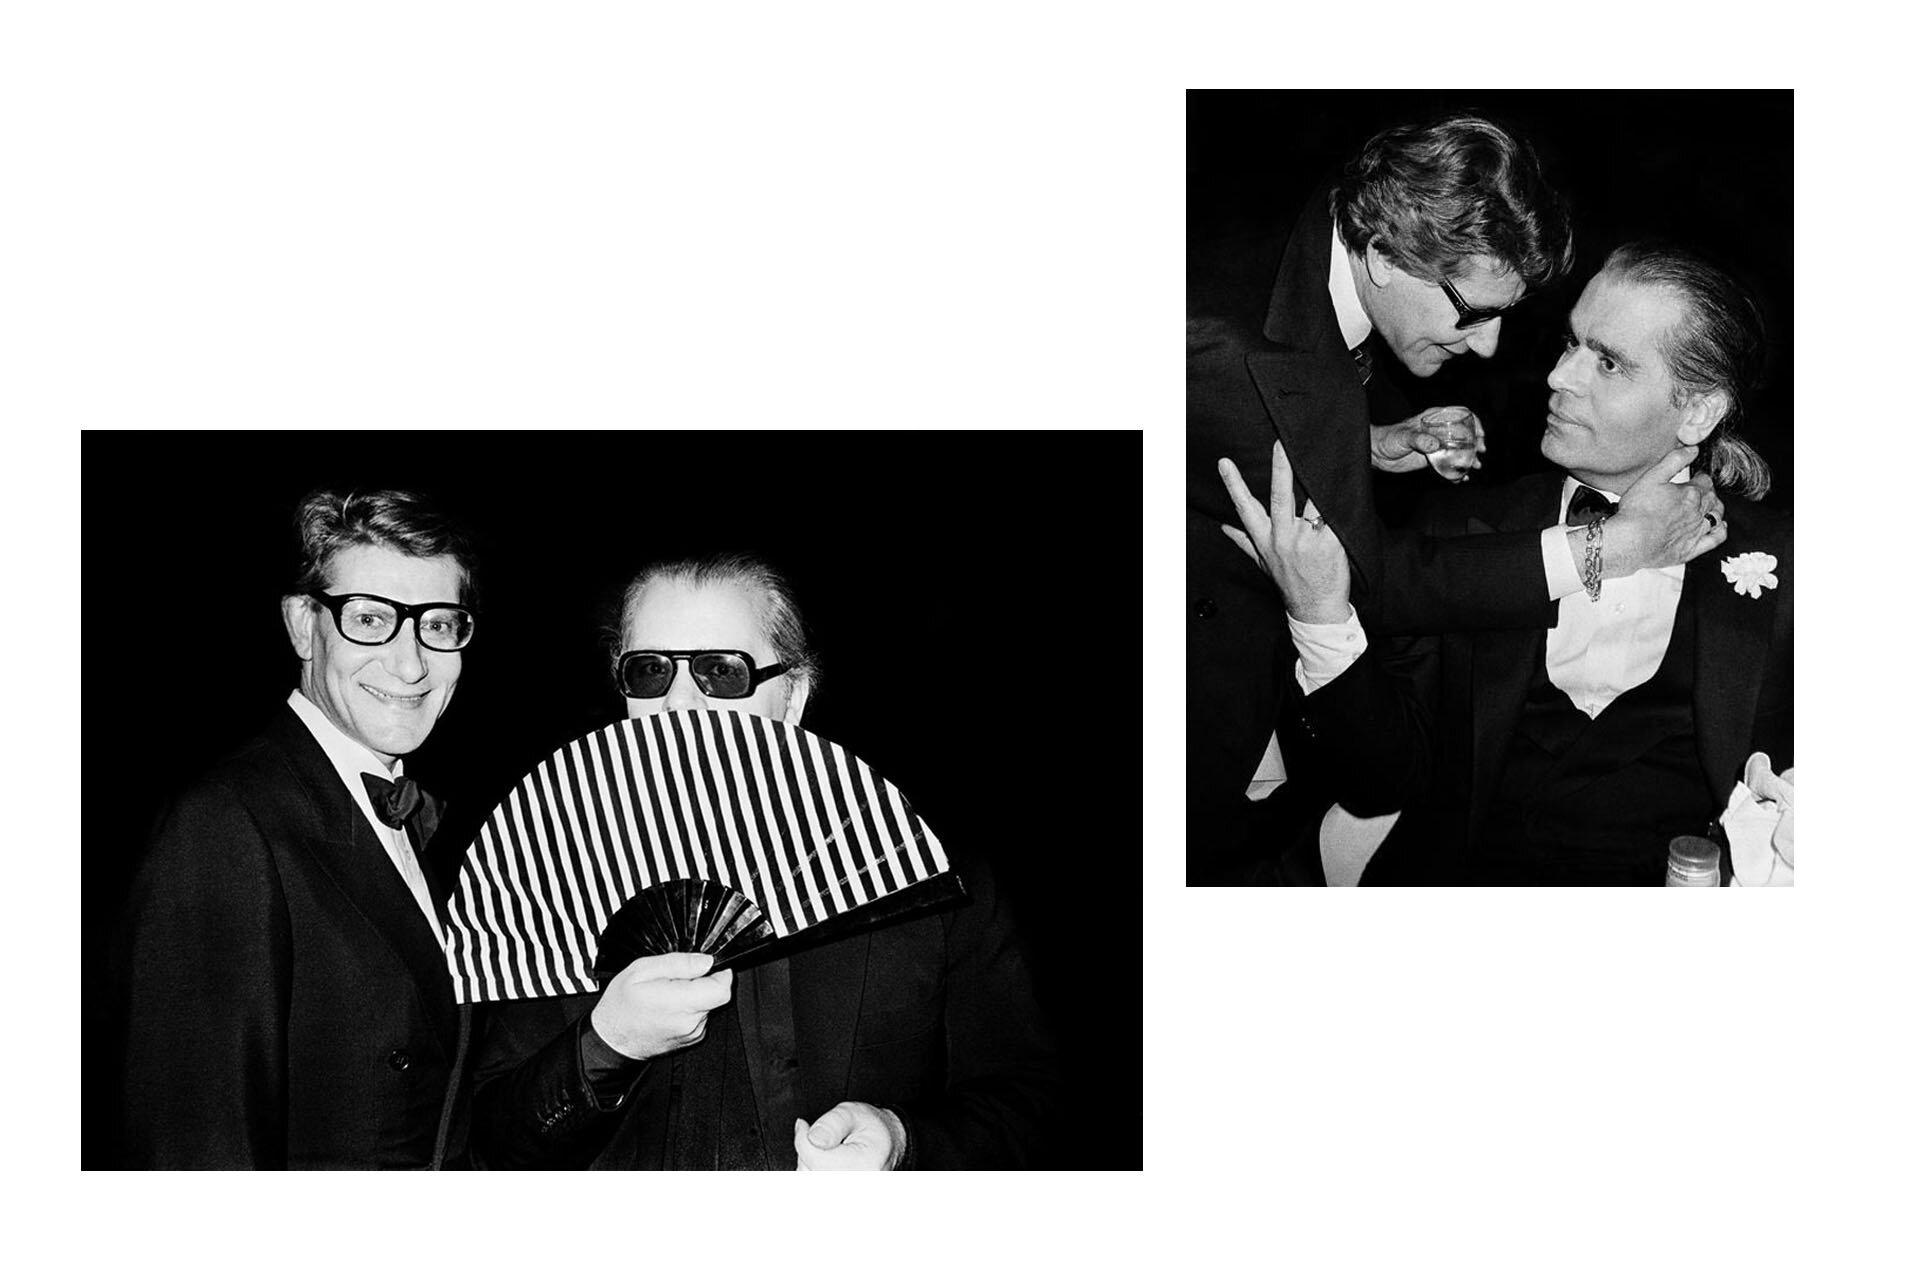 Yves Saint Laurent, Najsłynniejsi projektanci, Francuska moda, Haute Couture, Karl Lagerfeld